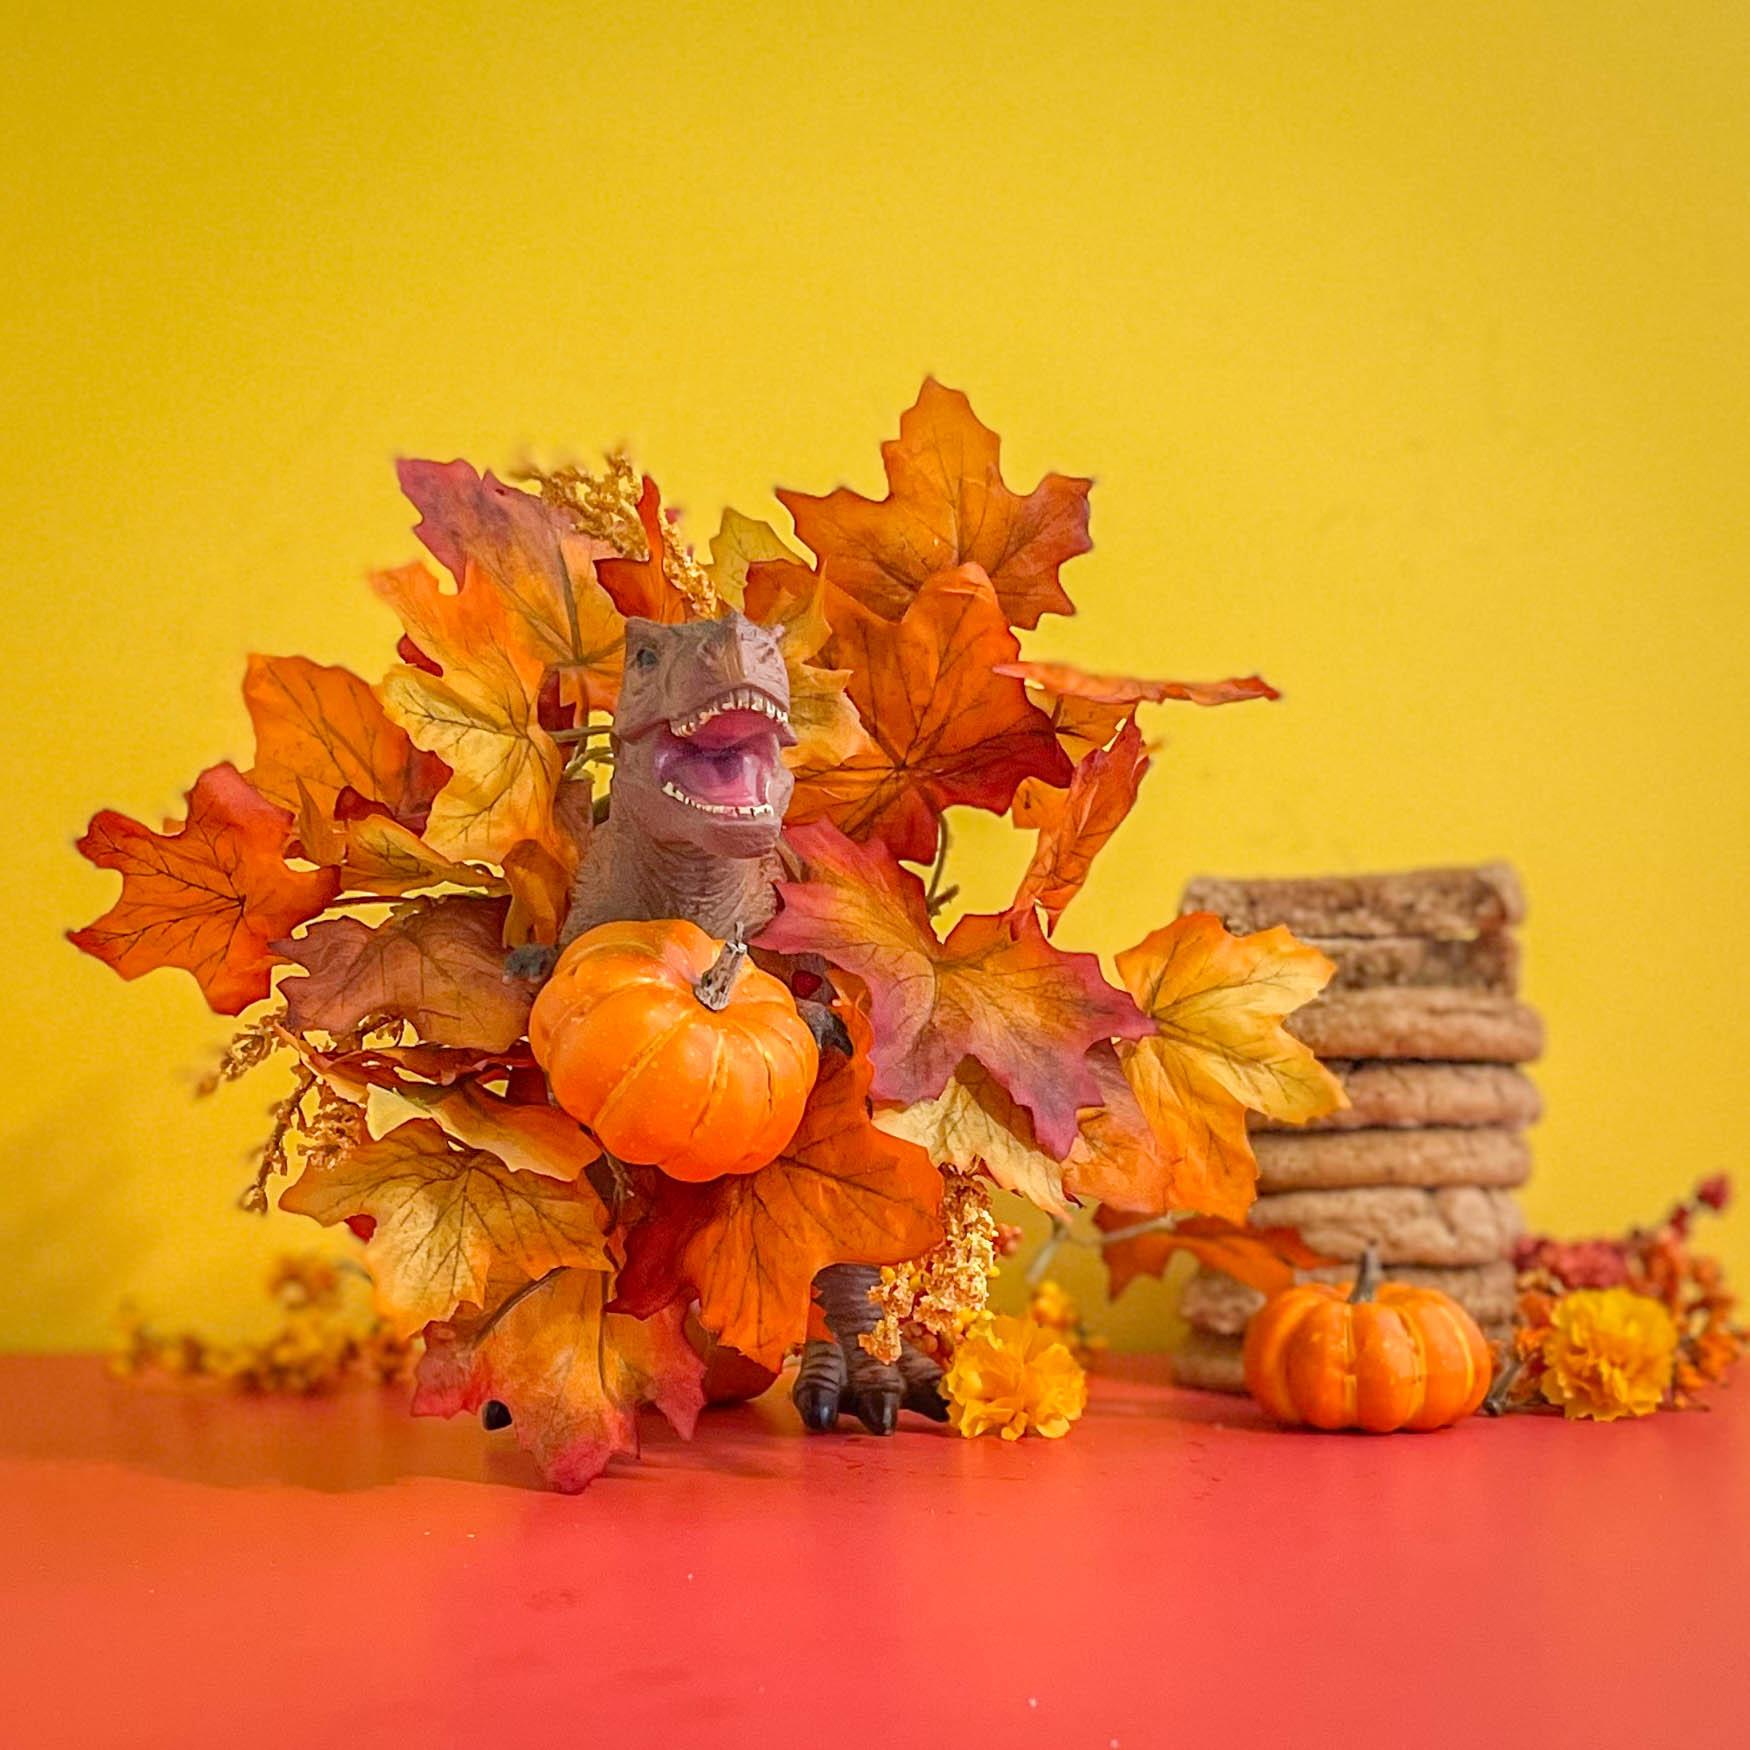 Pumpkin Spice Snickerdoodles close up